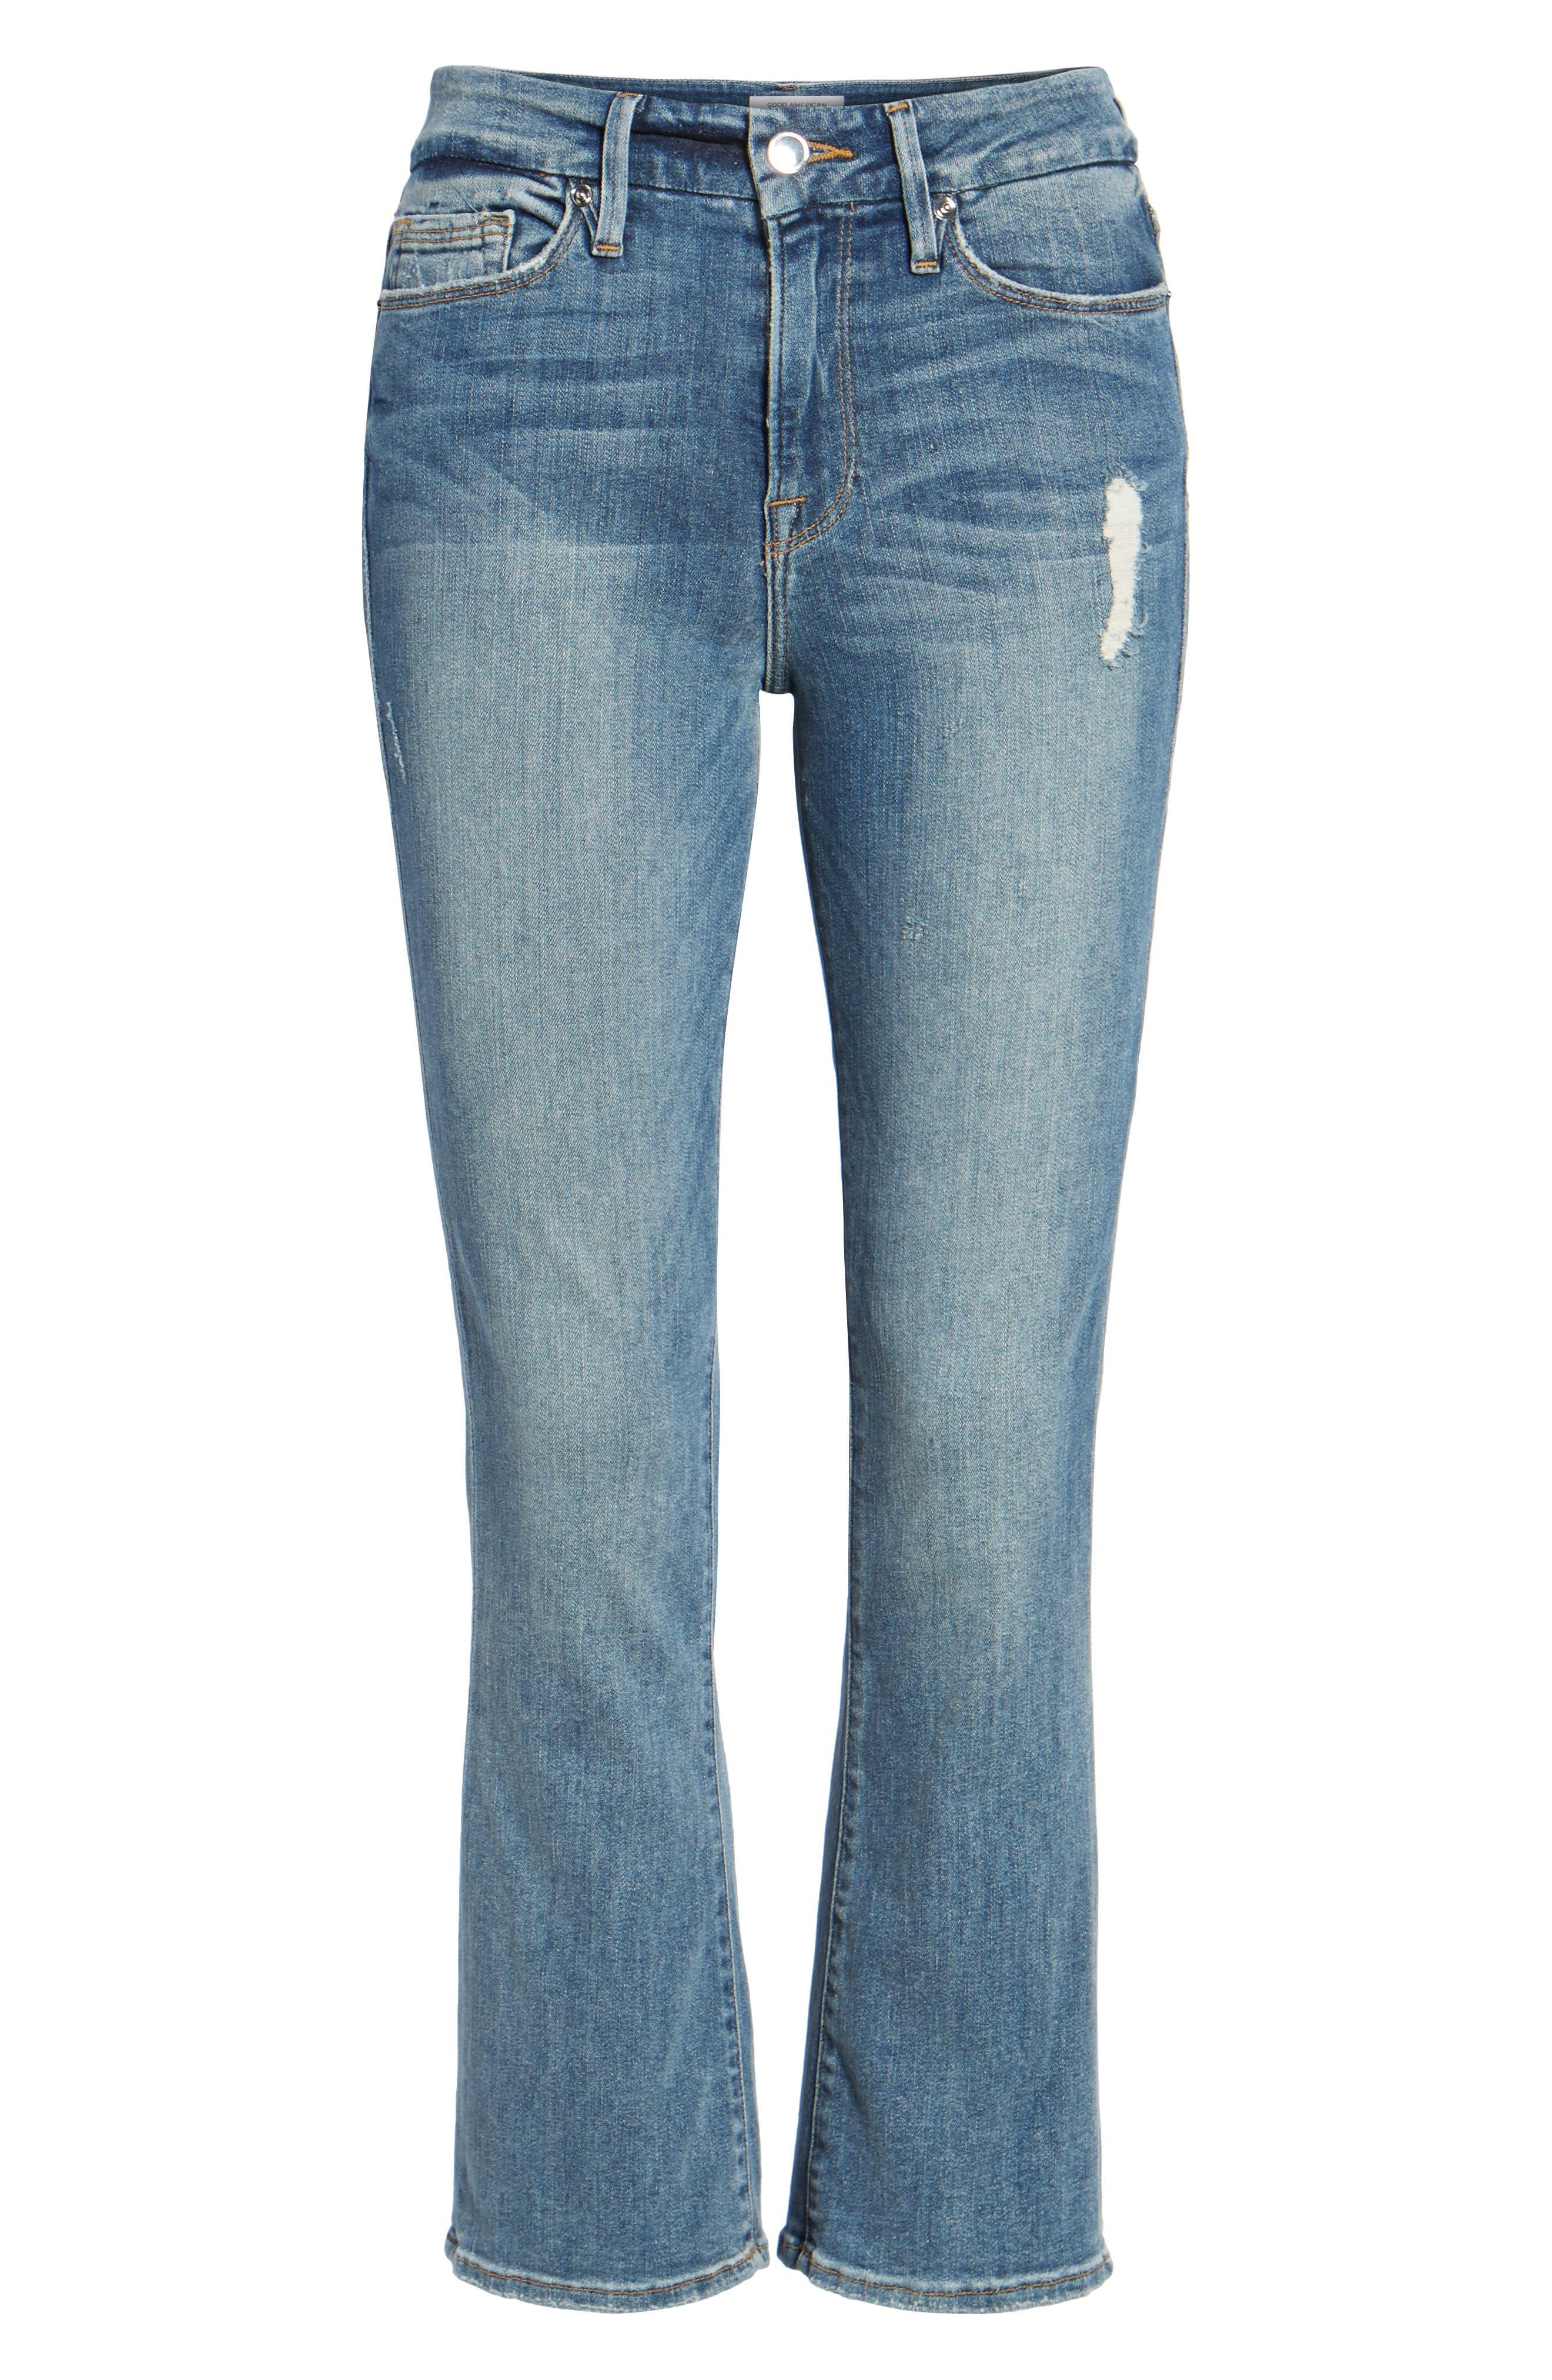 Good Cuts High Rise Boyfriend Jeans,                             Alternate thumbnail 7, color,                             Blue 012